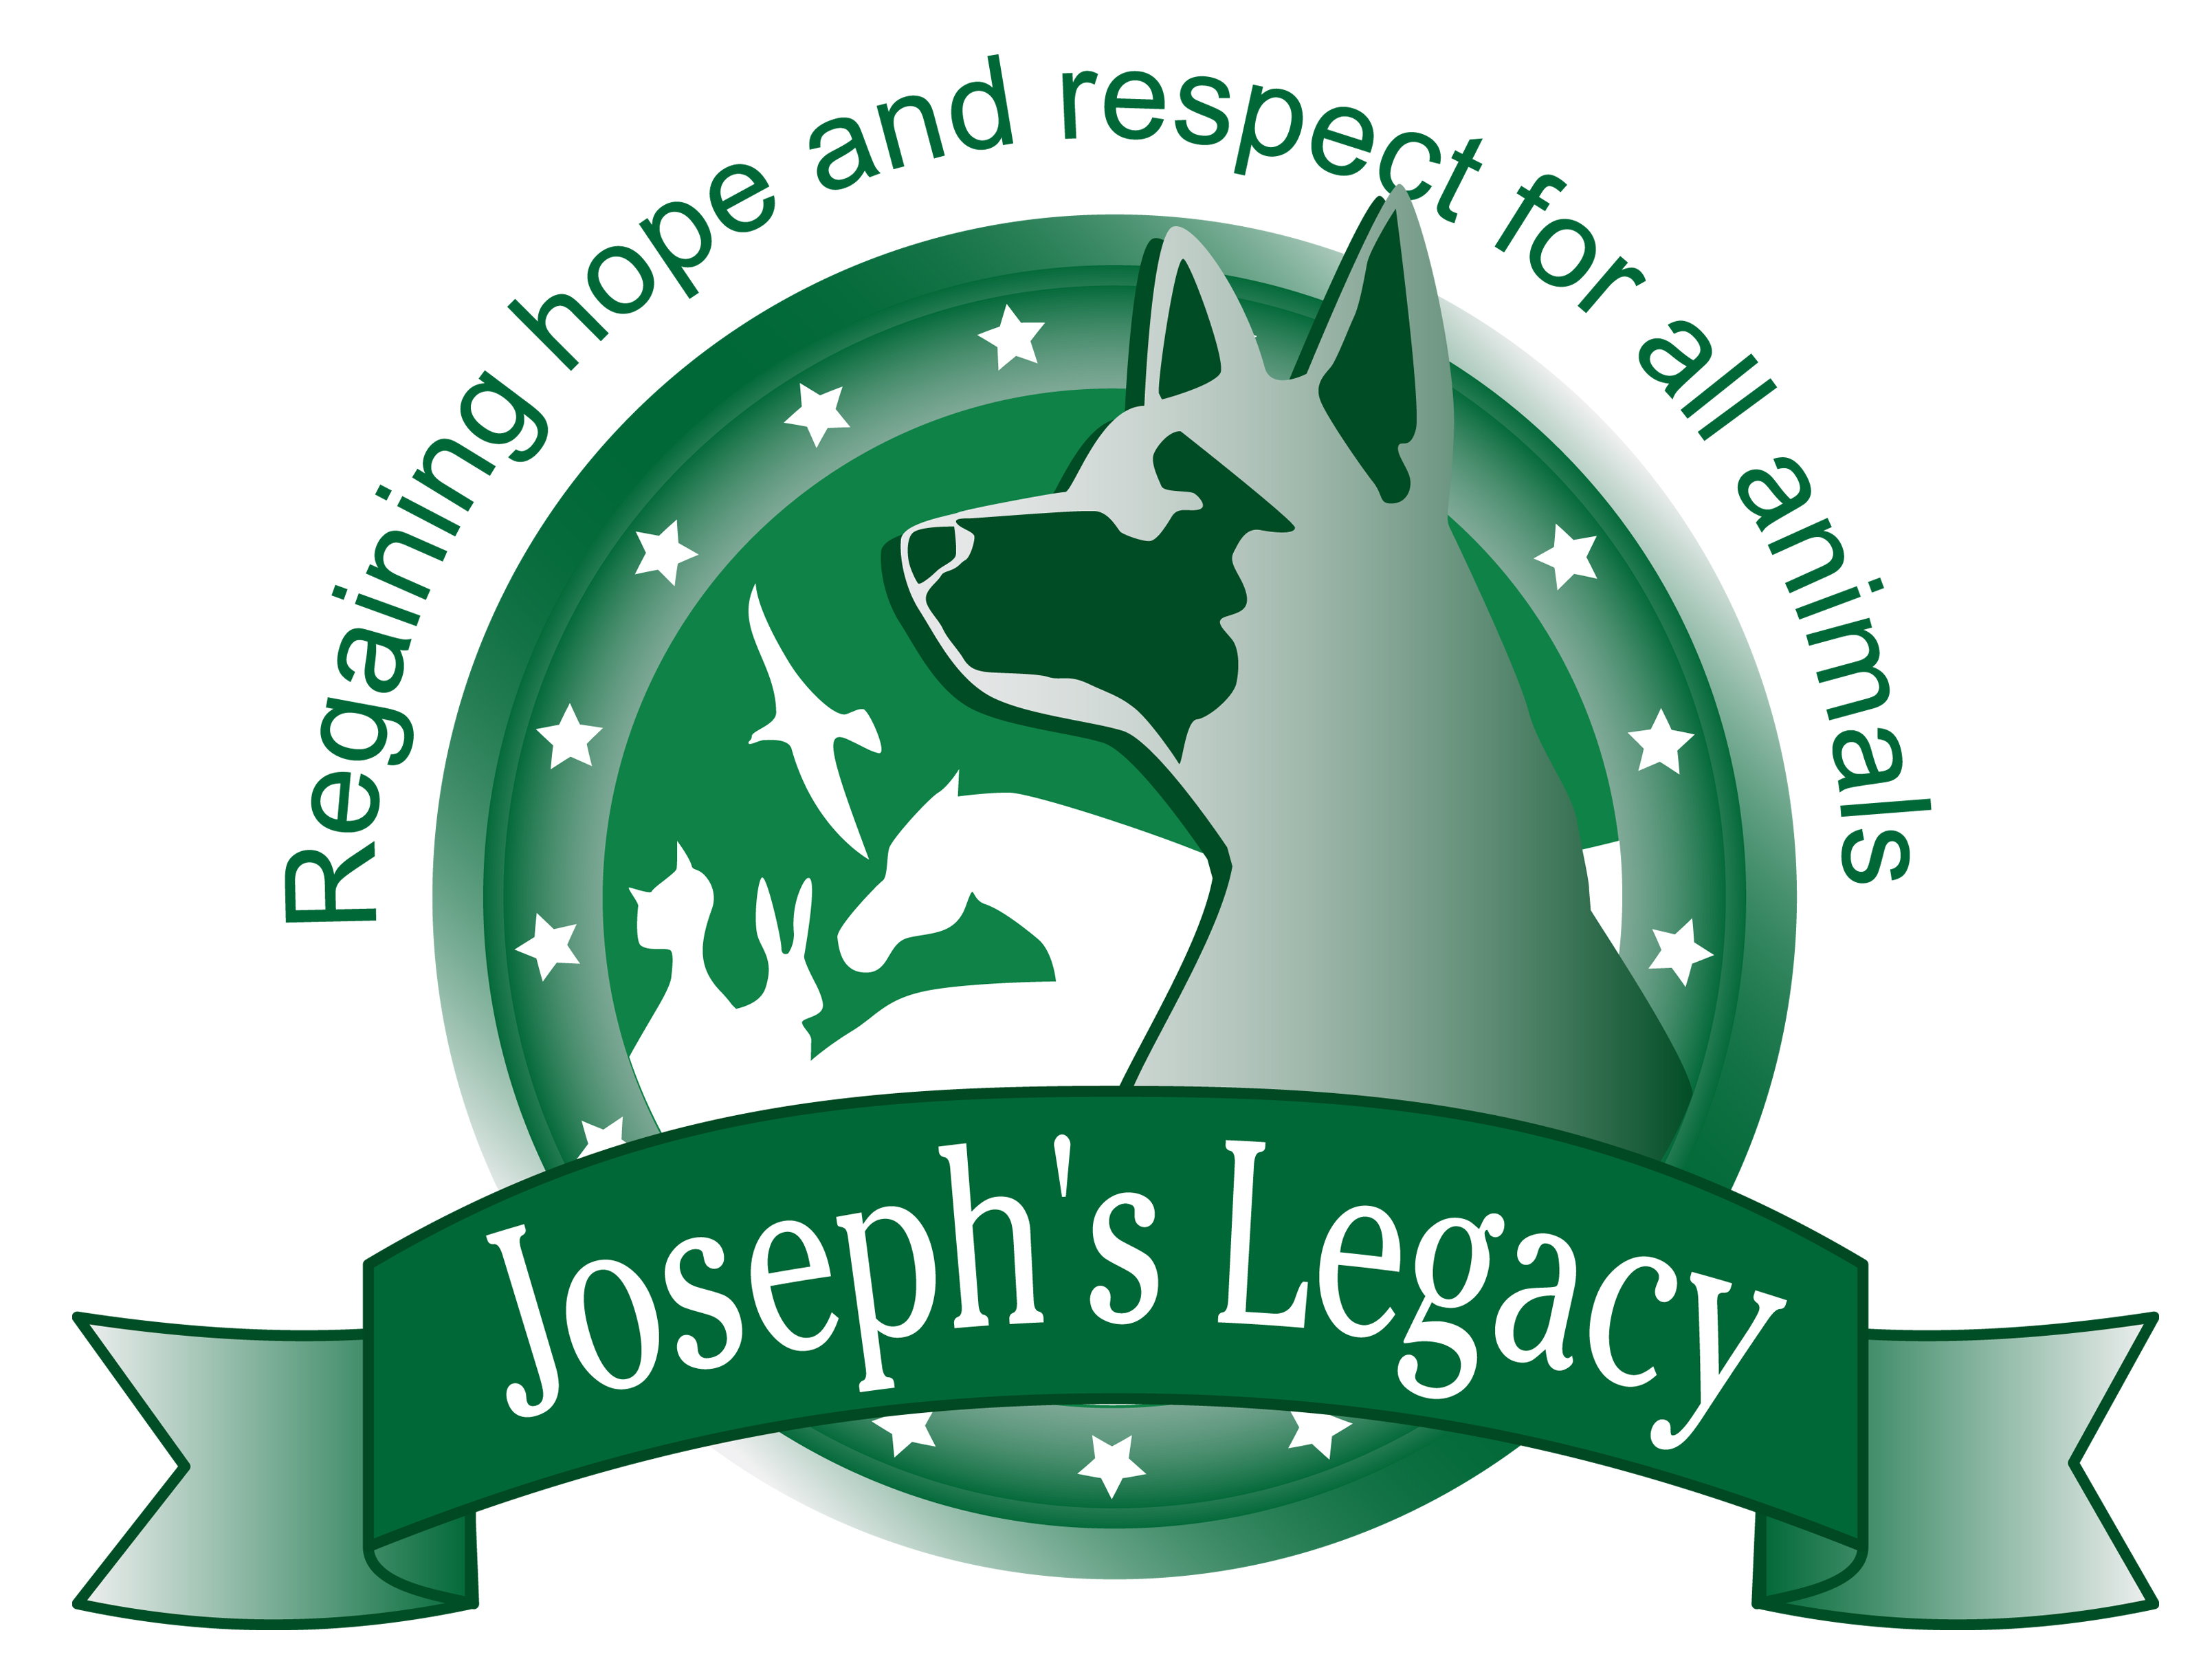 Josephs Legacy